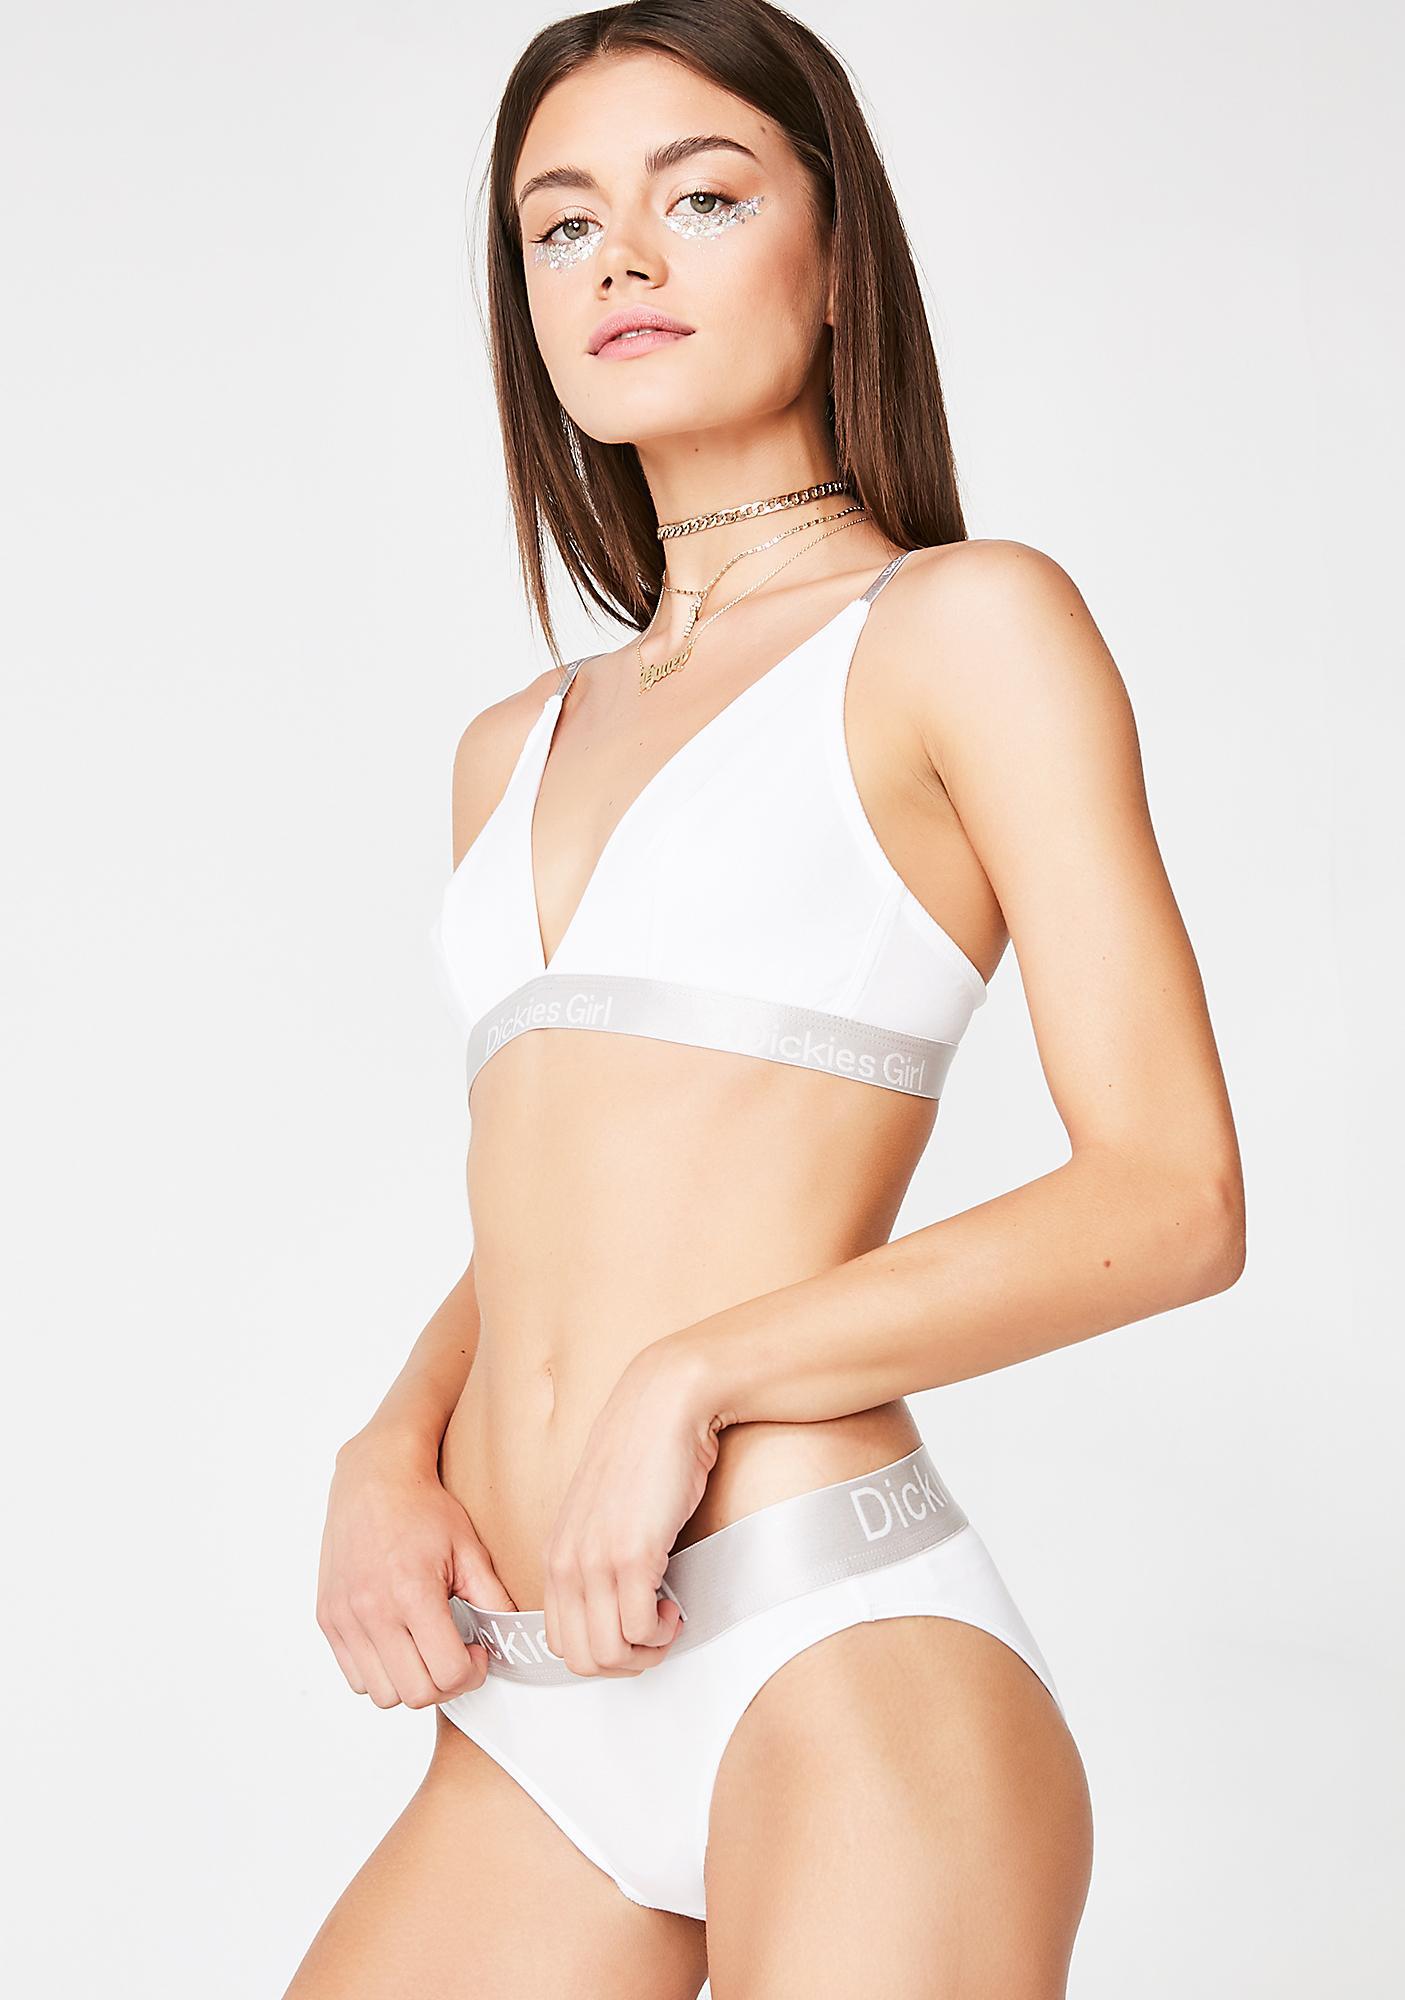 87e24daa9 Dickies Girl Innocent Triangle Bra N Bikini Set